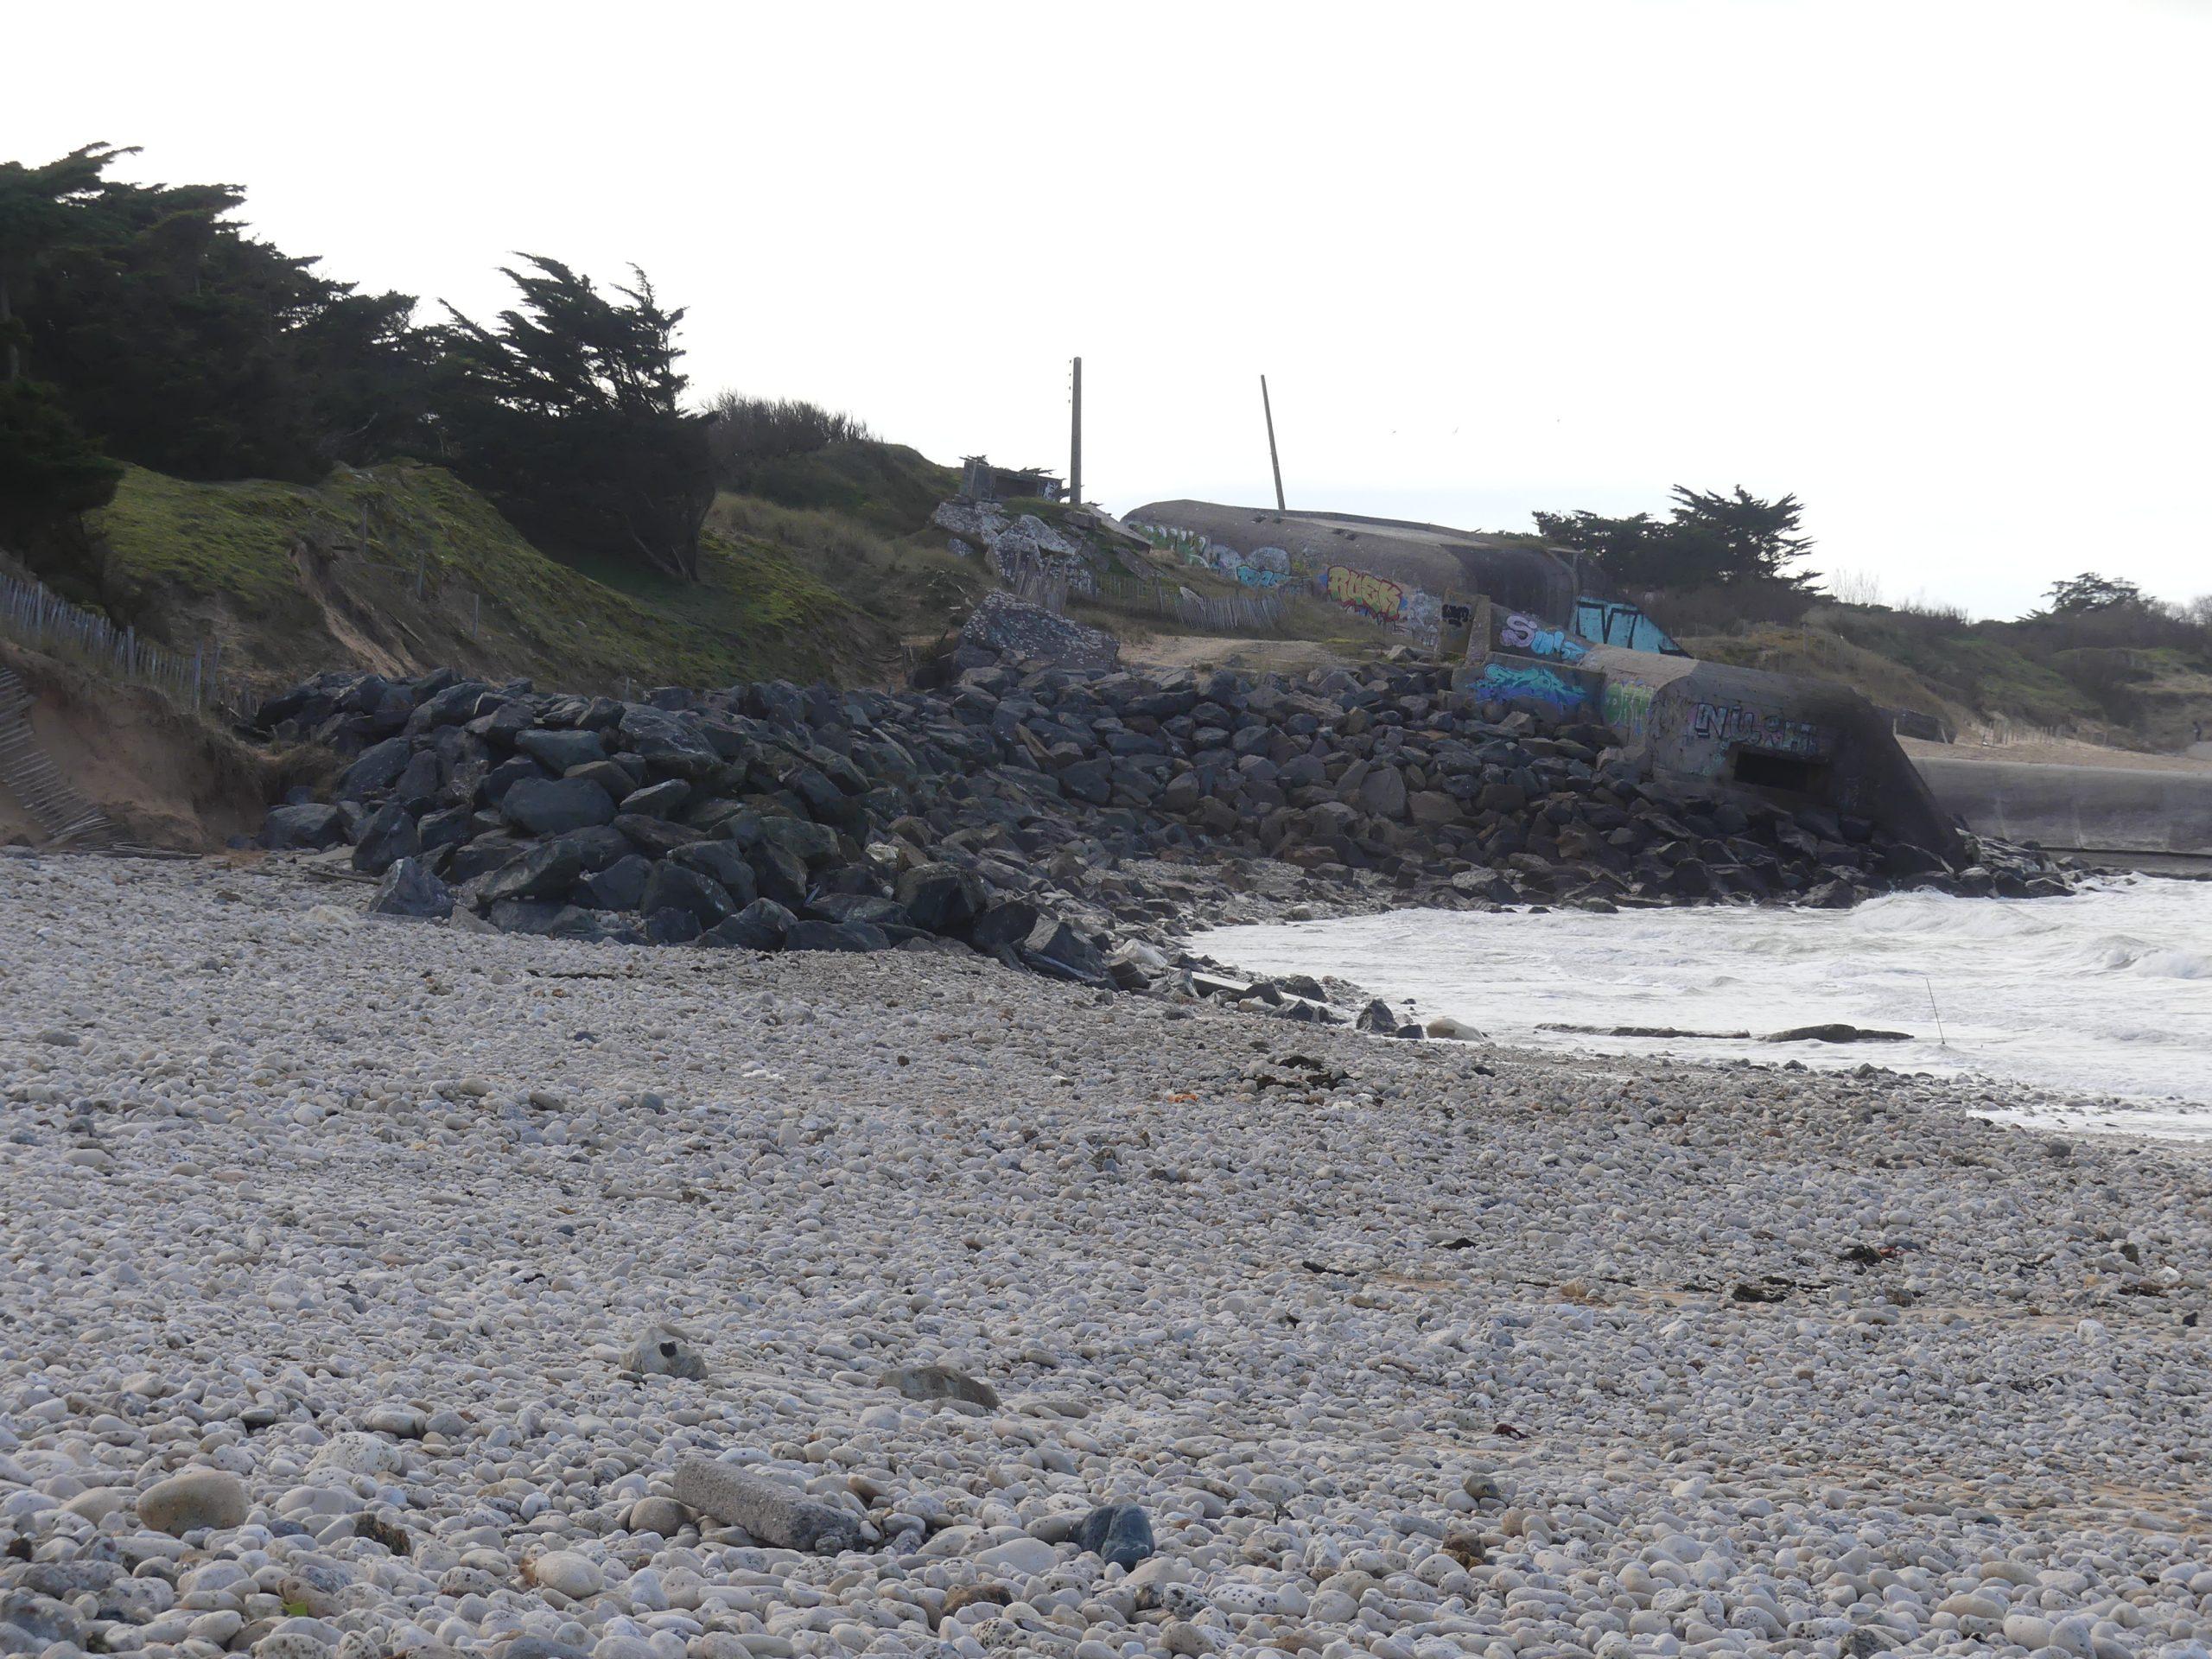 Saint-Clément des Baleines - Zanuck - 7 février 2021